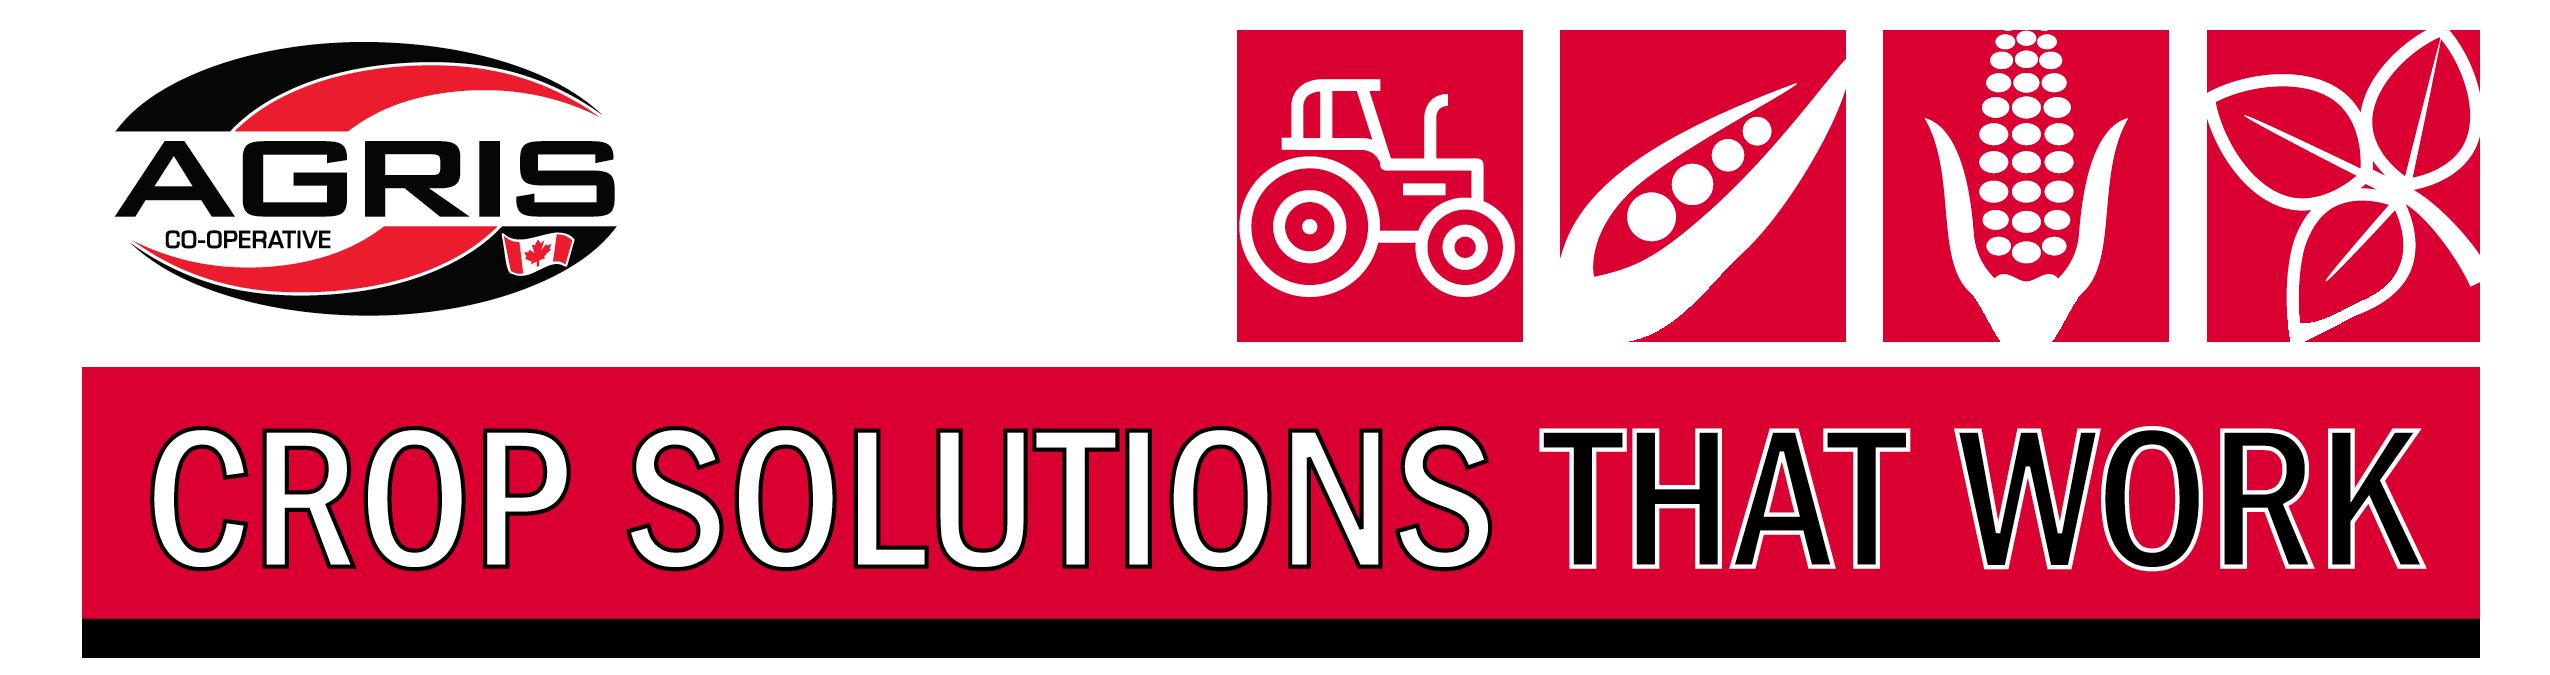 CSTW_header640w_AGRIS.png